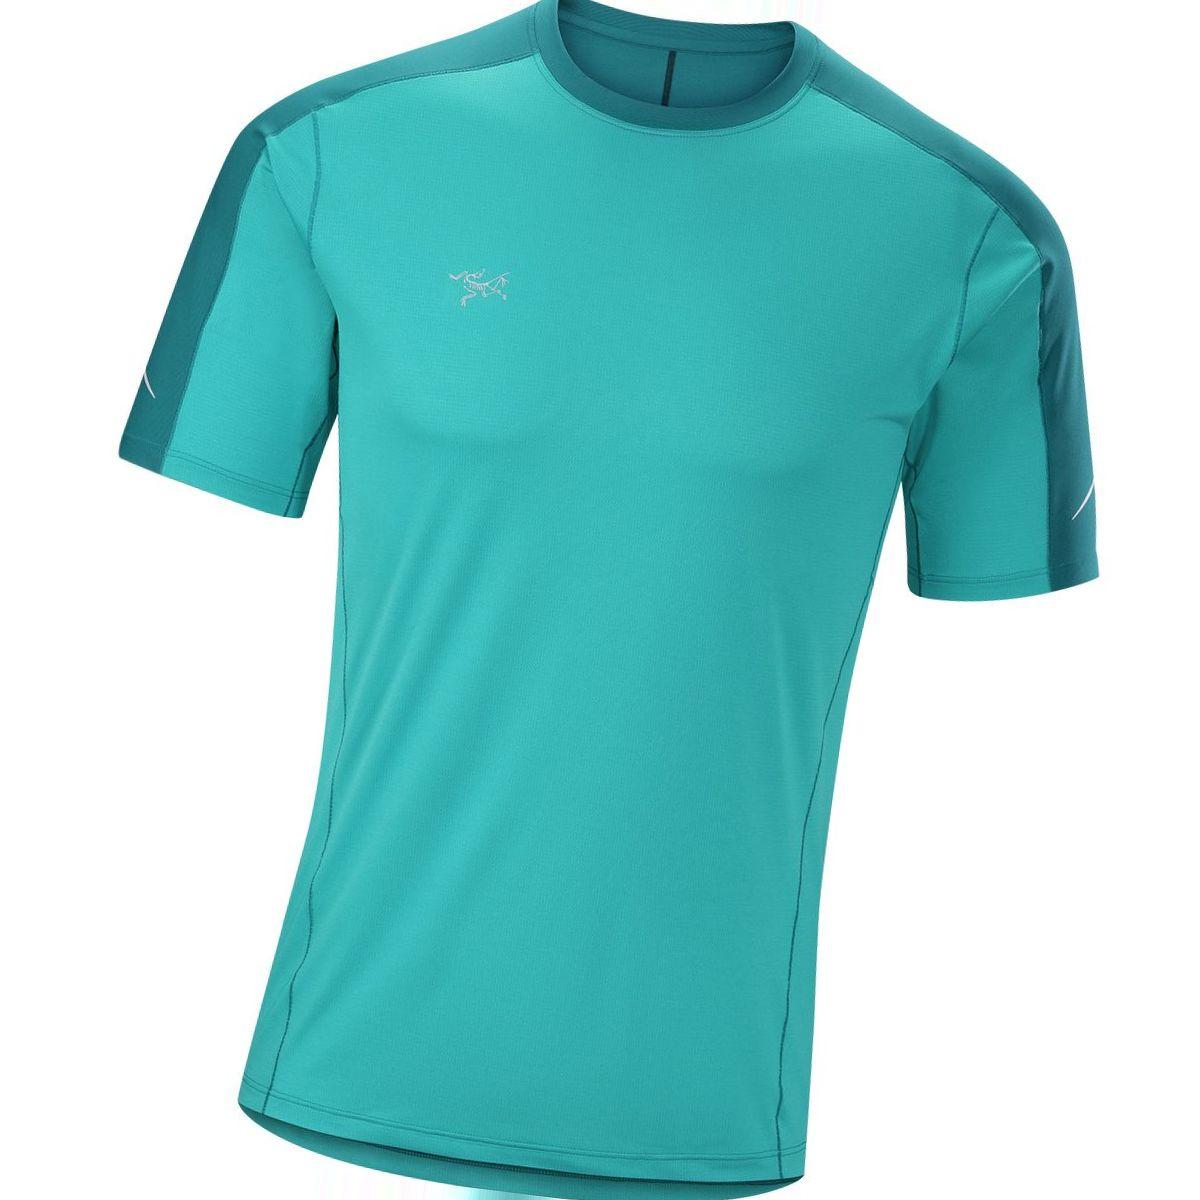 Arc'teryx Motus Comp Shirt - Men's